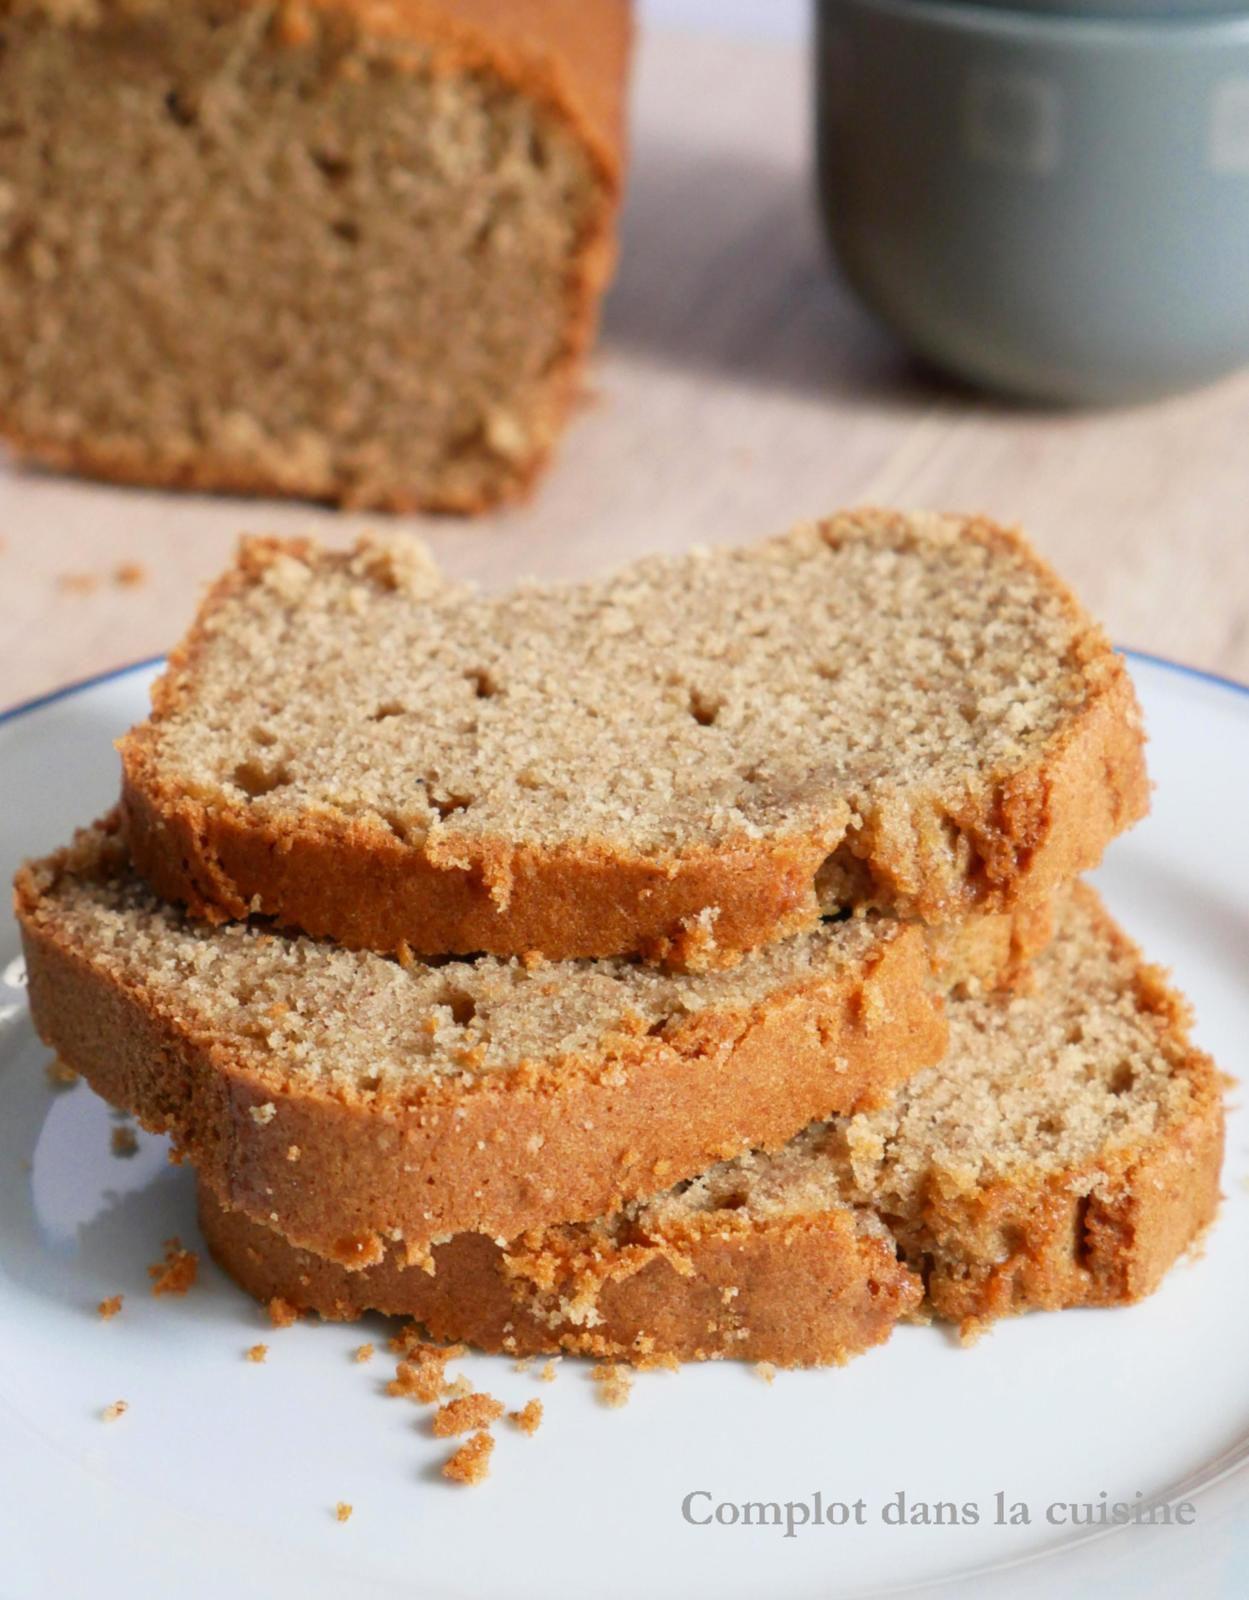 Cake amande et farine de châtaigne - The cosy cake